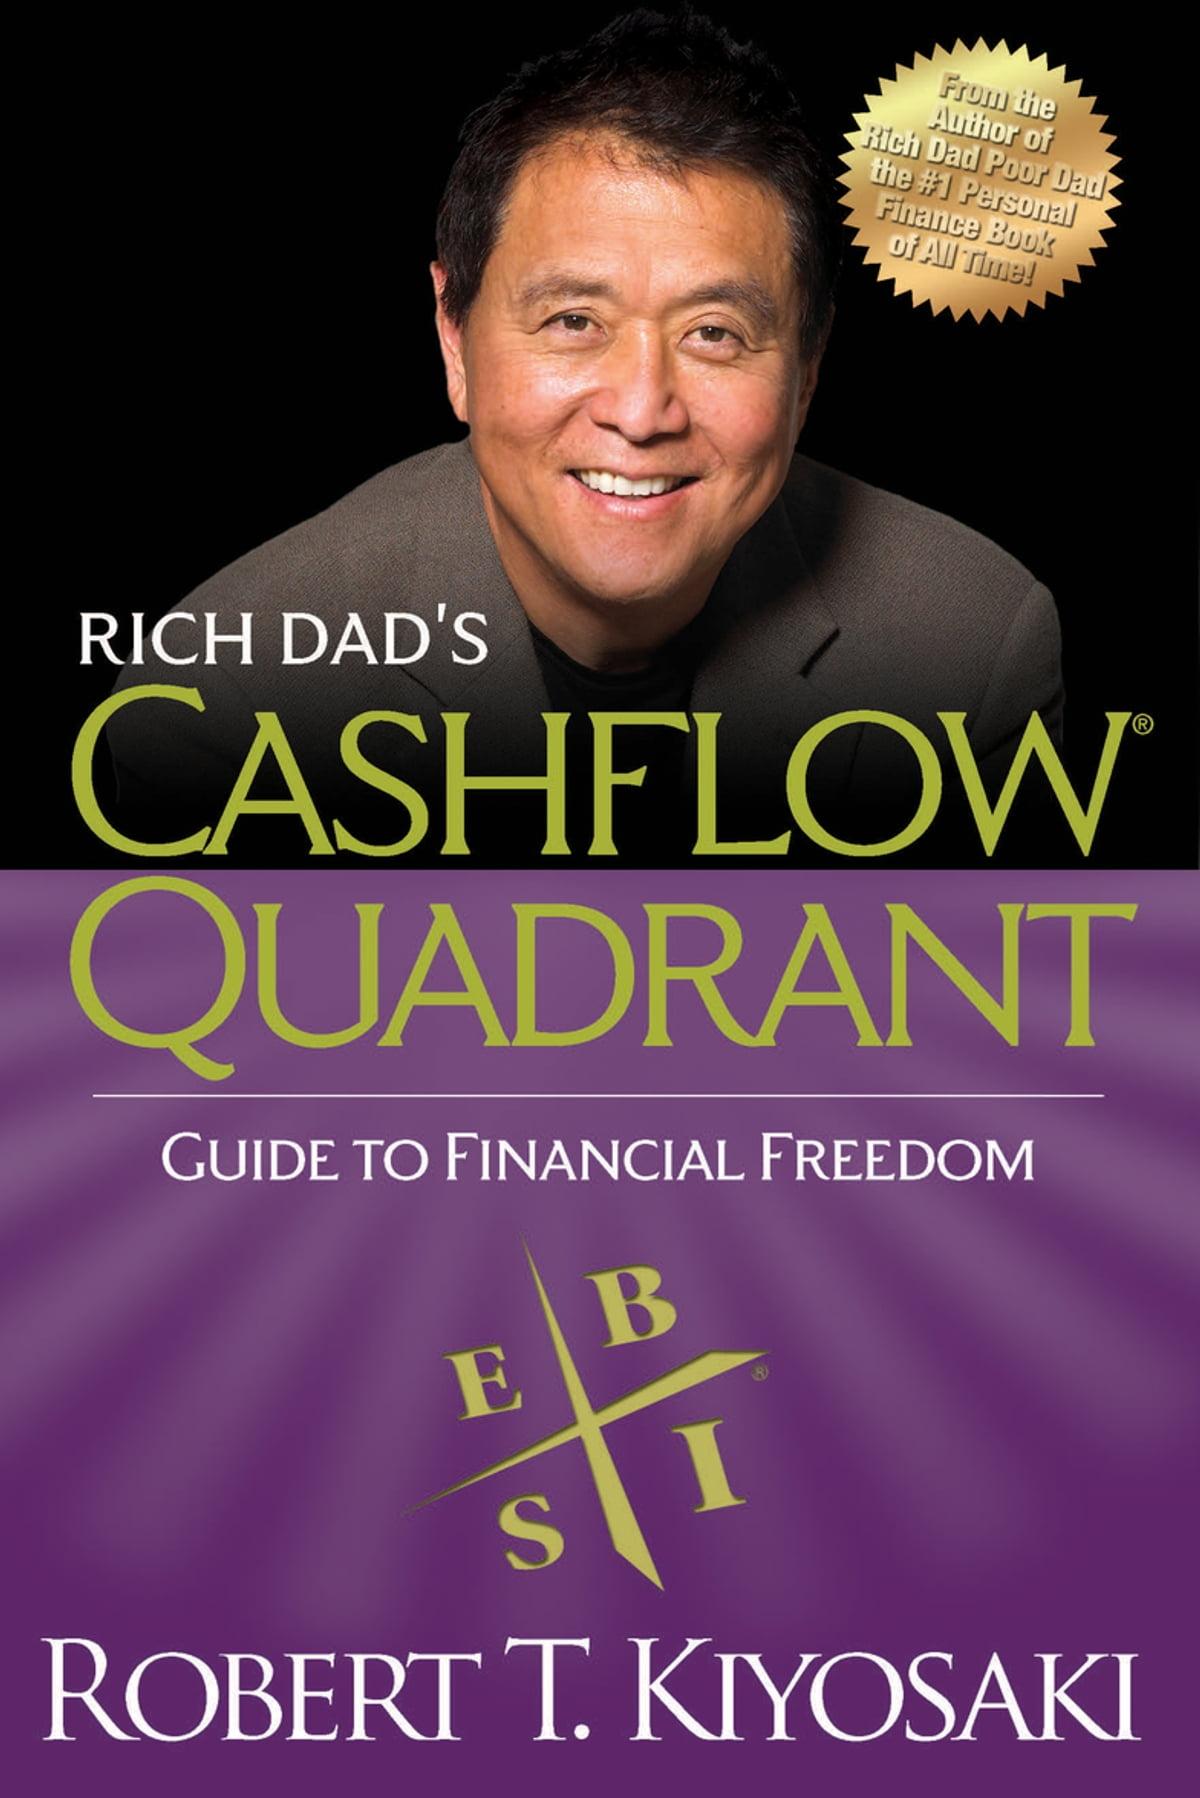 Rich Dad S Cashflow Quadrant Ebook By Robert T Kiyosaki